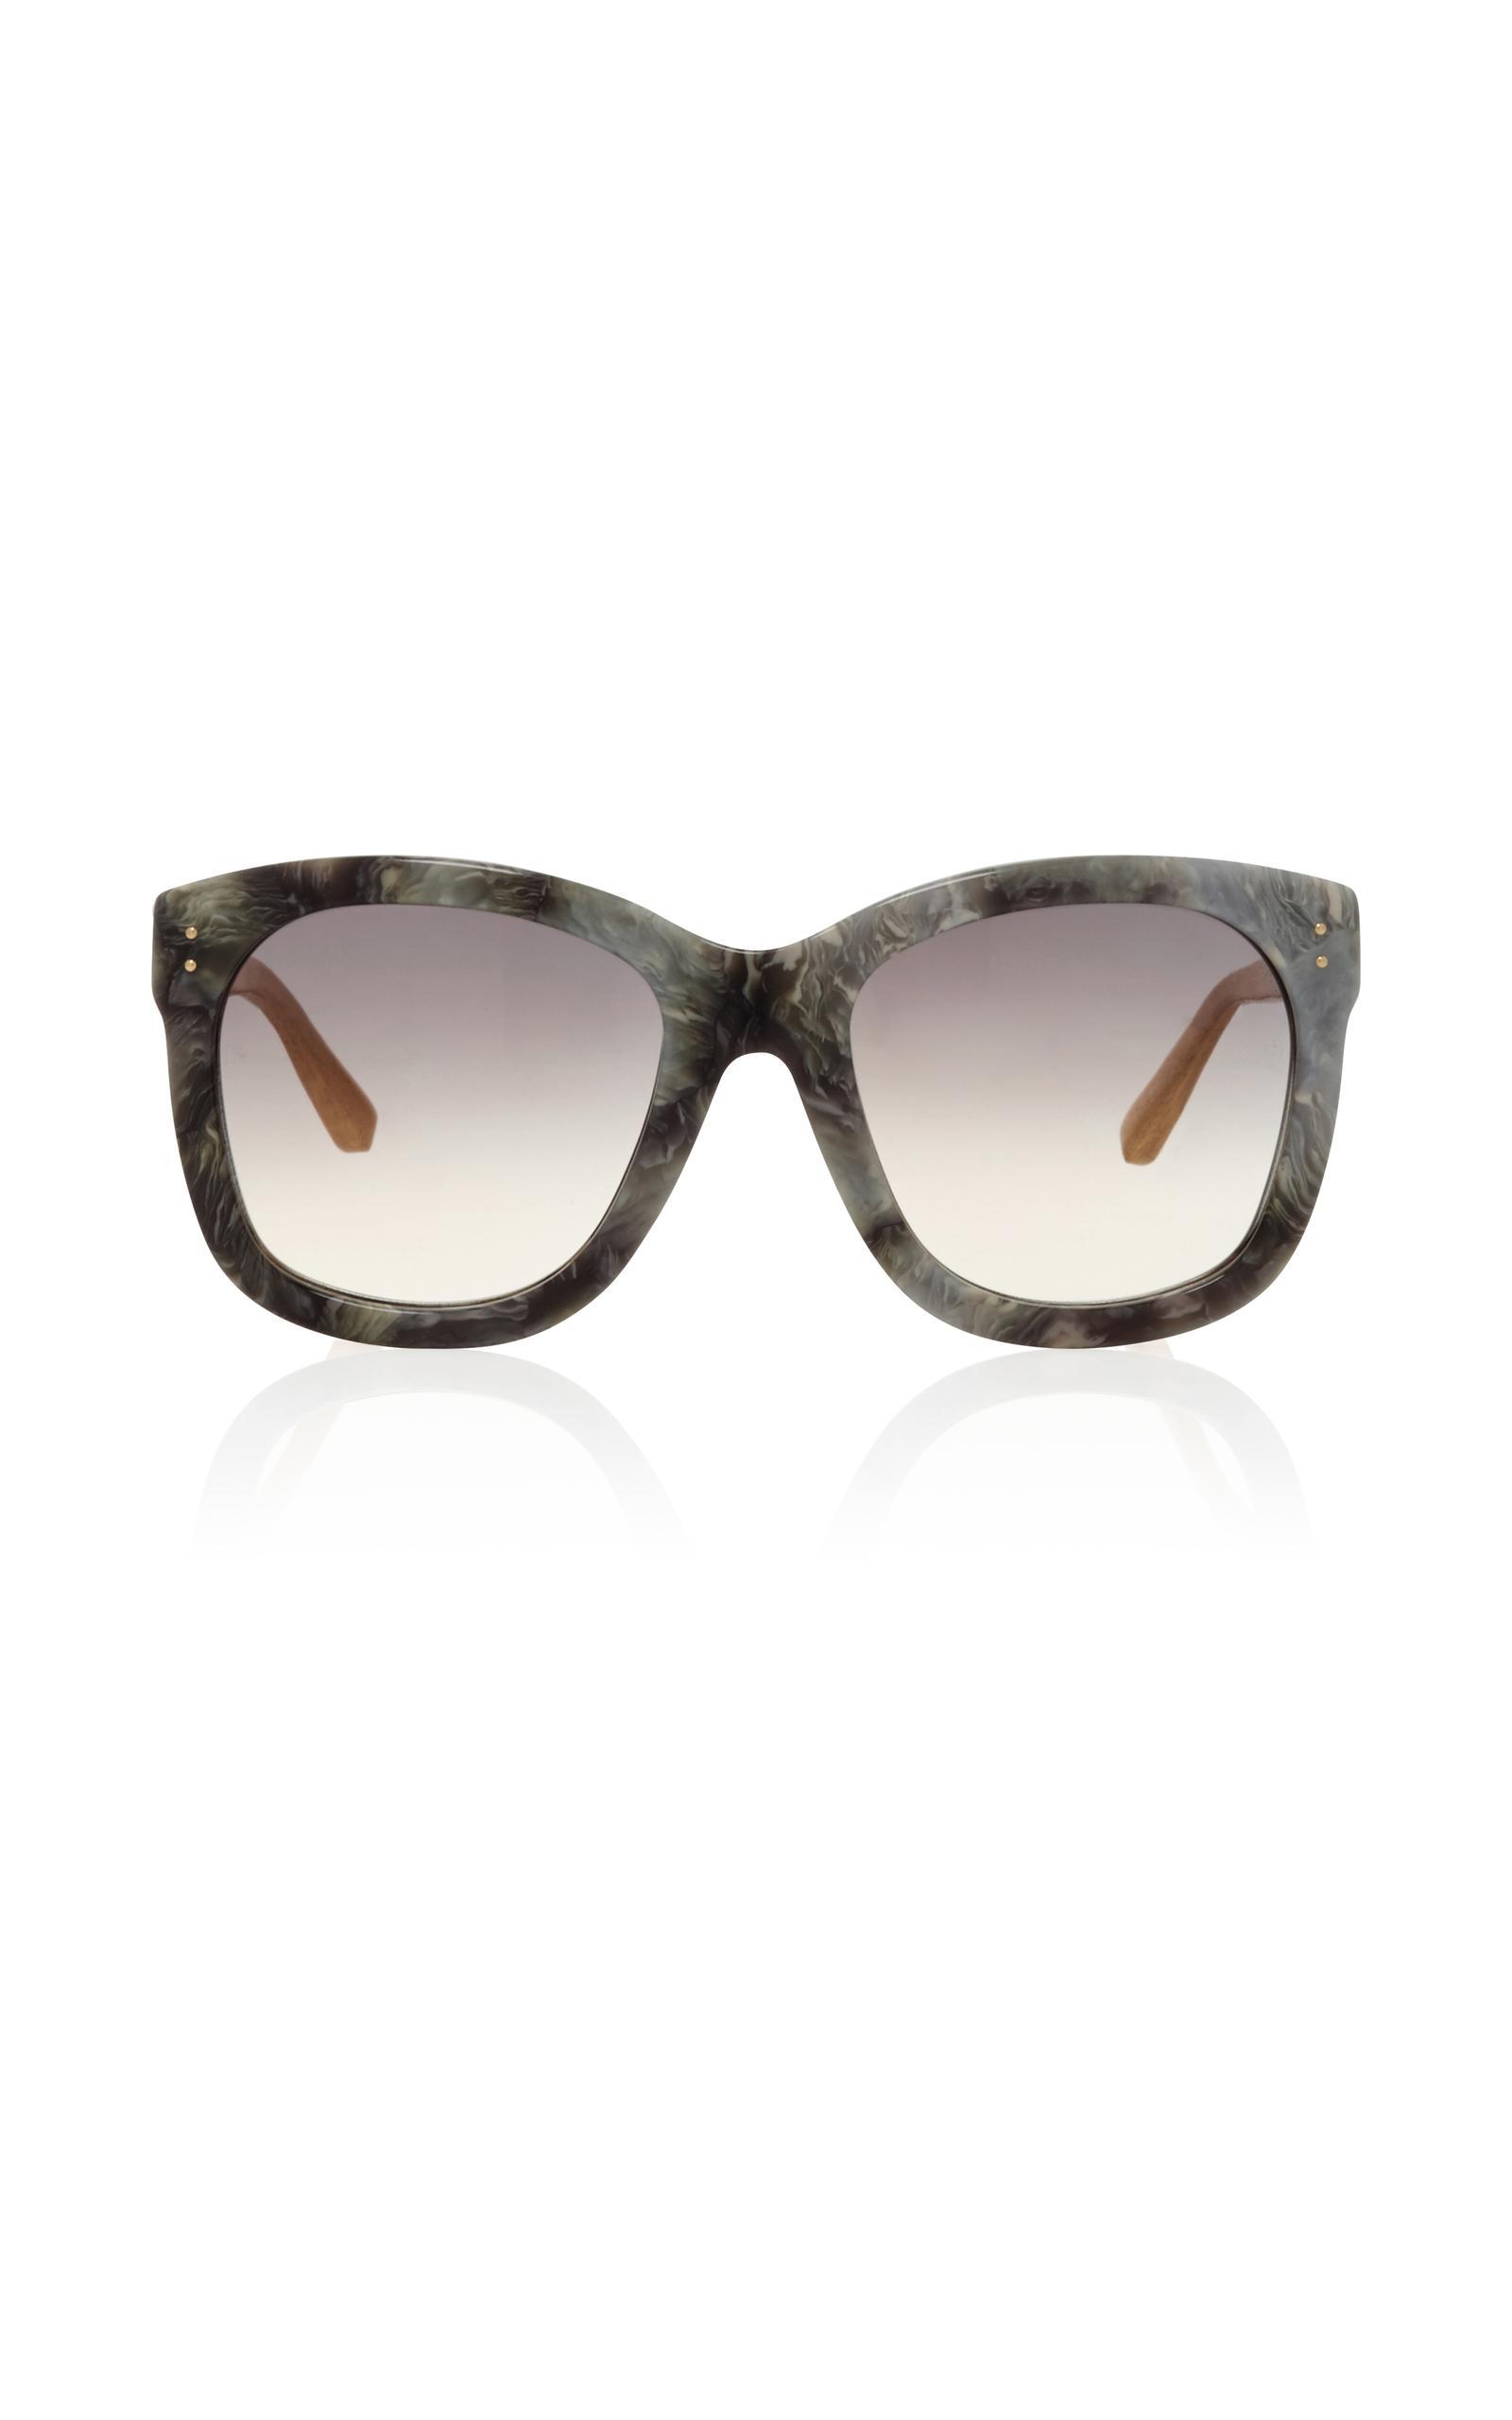 2638e519bf Lyst - Linda Farrow Grey Marble Sunglasses in Gray